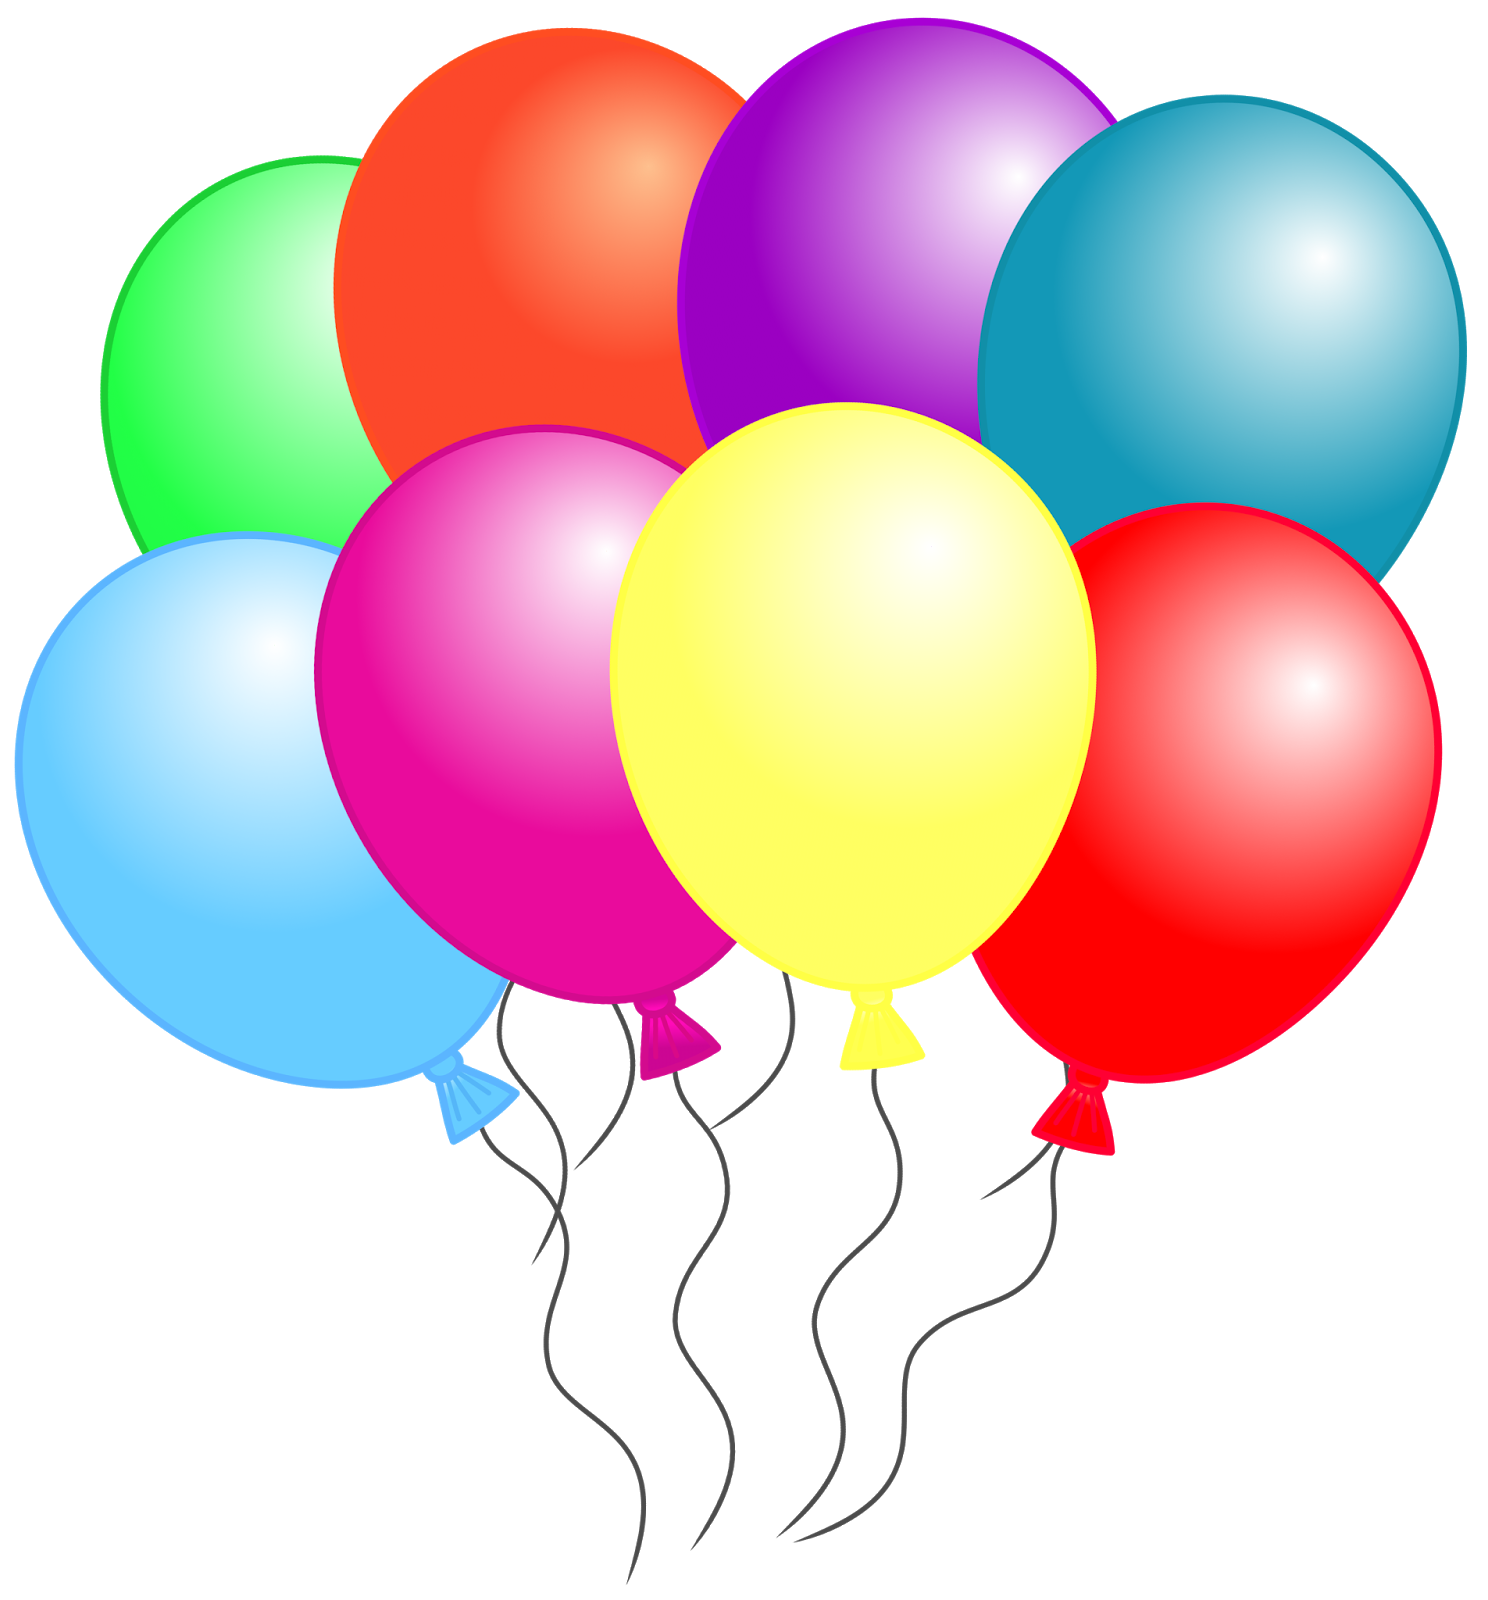 Birthday Balloons Balloons, Birthday balloons, Balloon